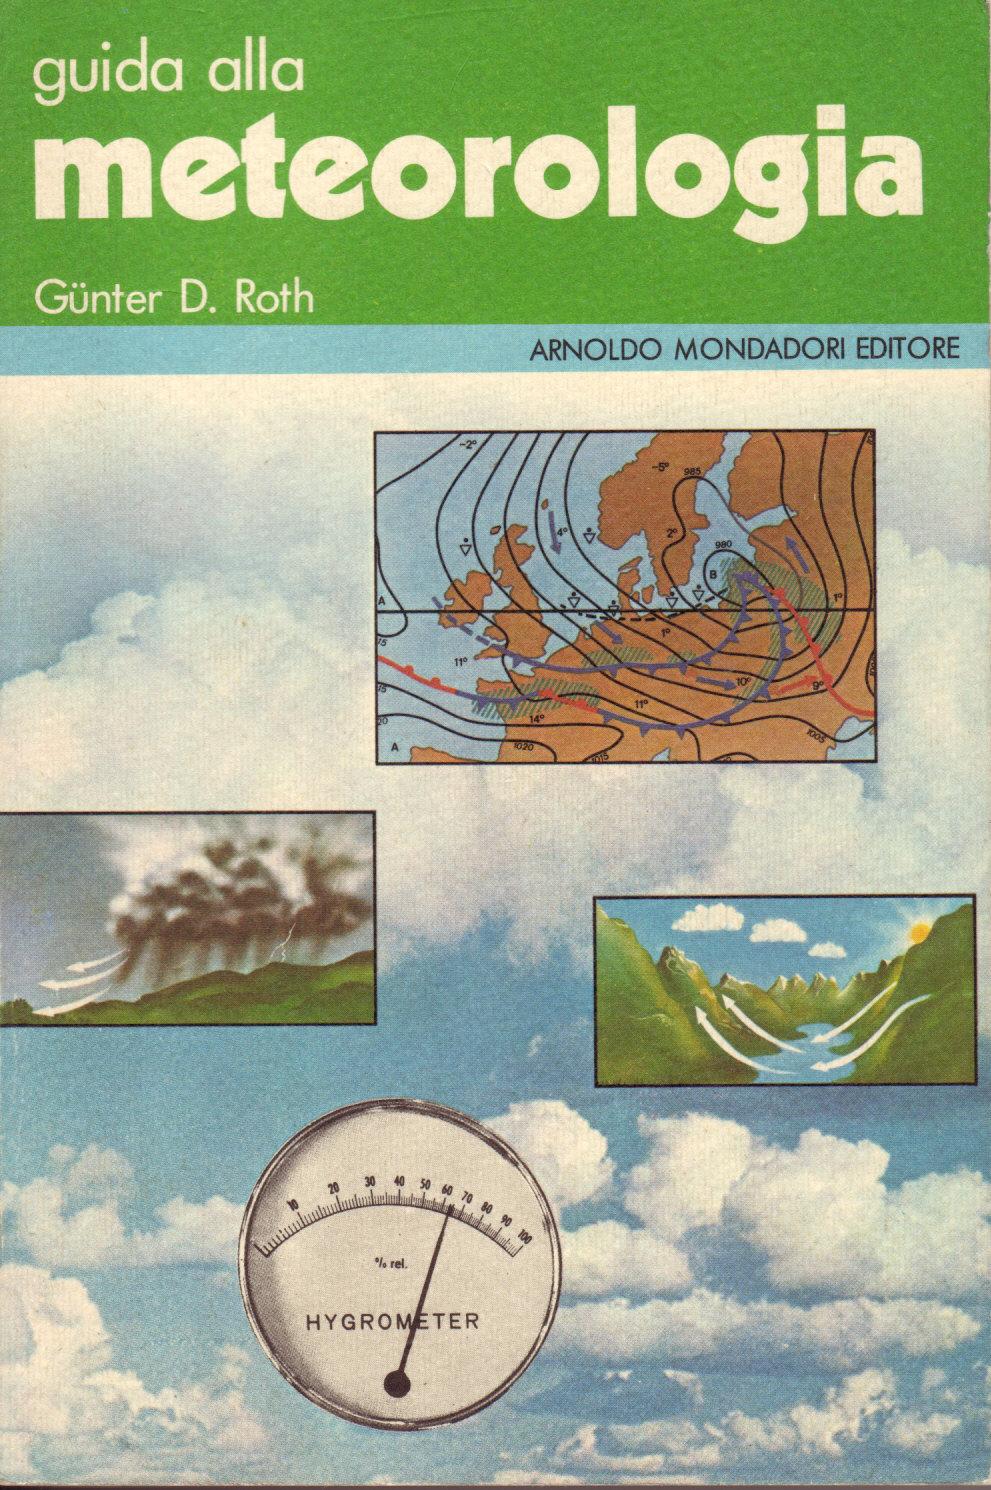 Guida alla meteorologia